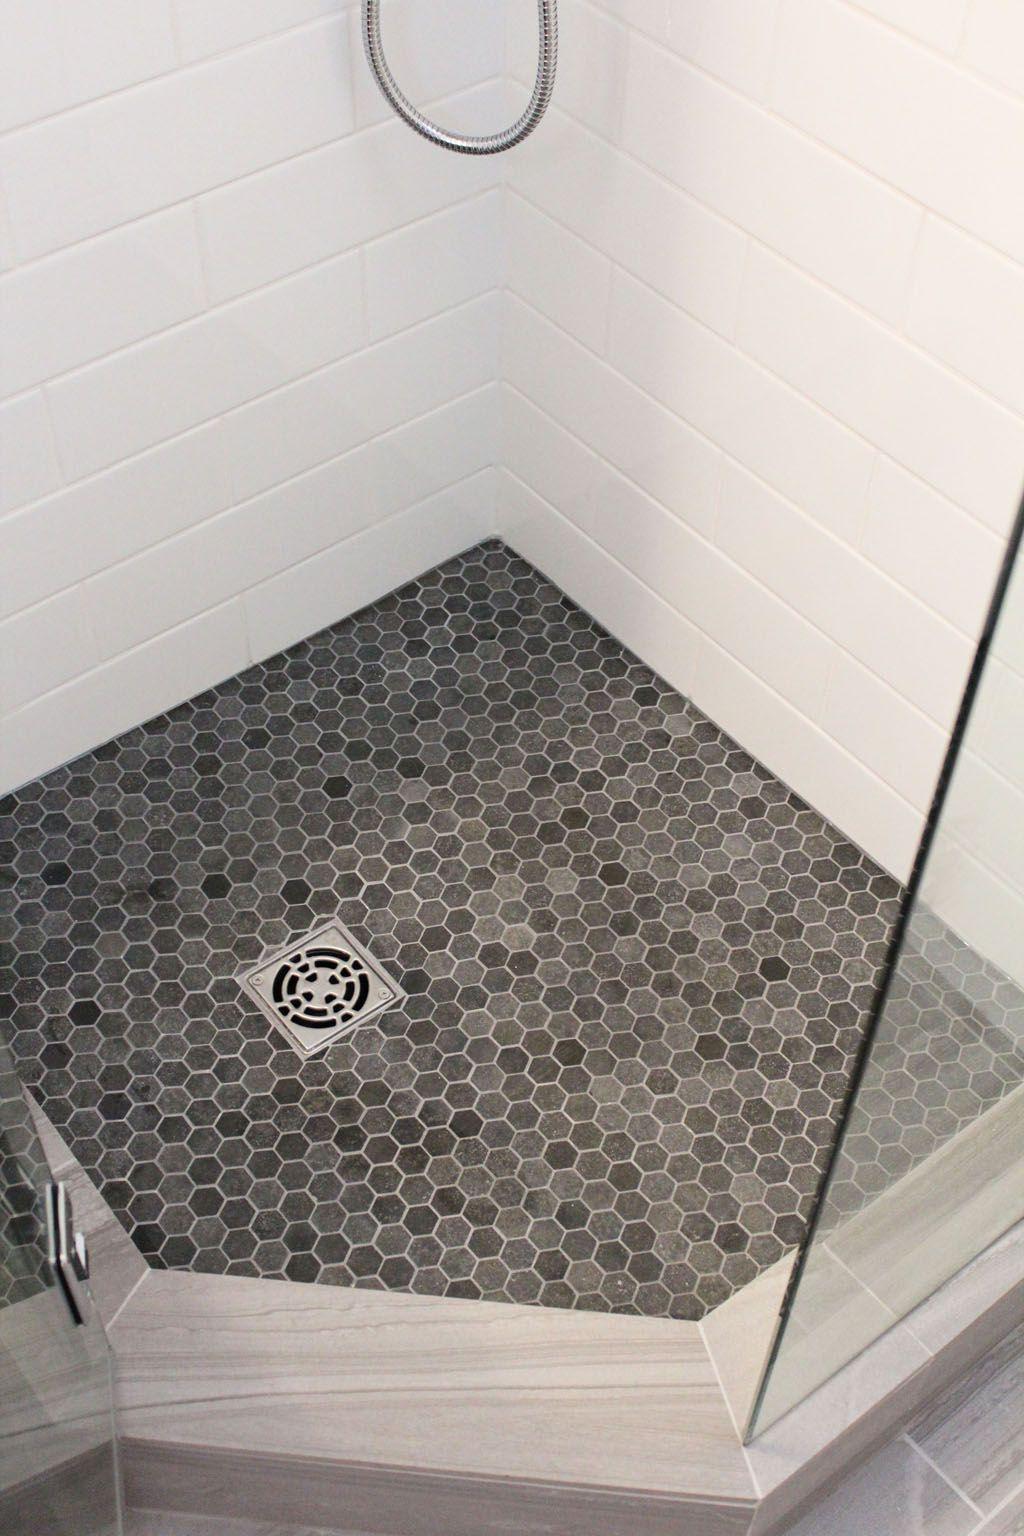 Honeycomb floor with white tile | Beautiful bathroom renovations